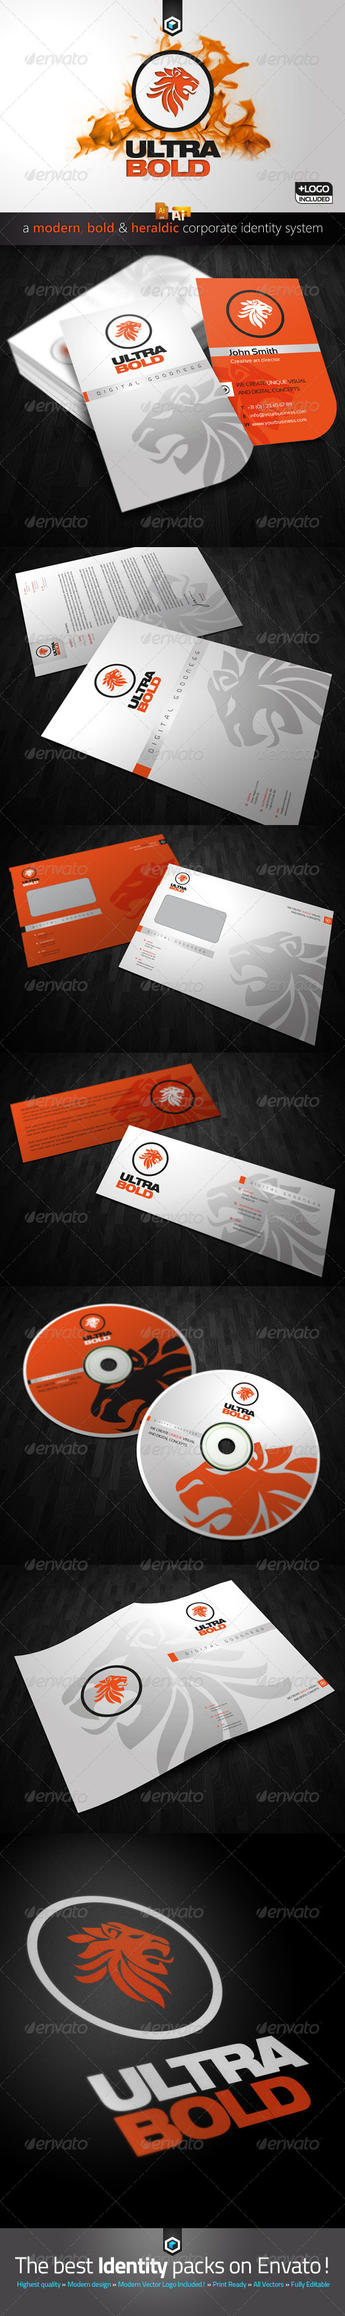 RW Modern Bold Heraldic Corporate Identity by Reclameworks